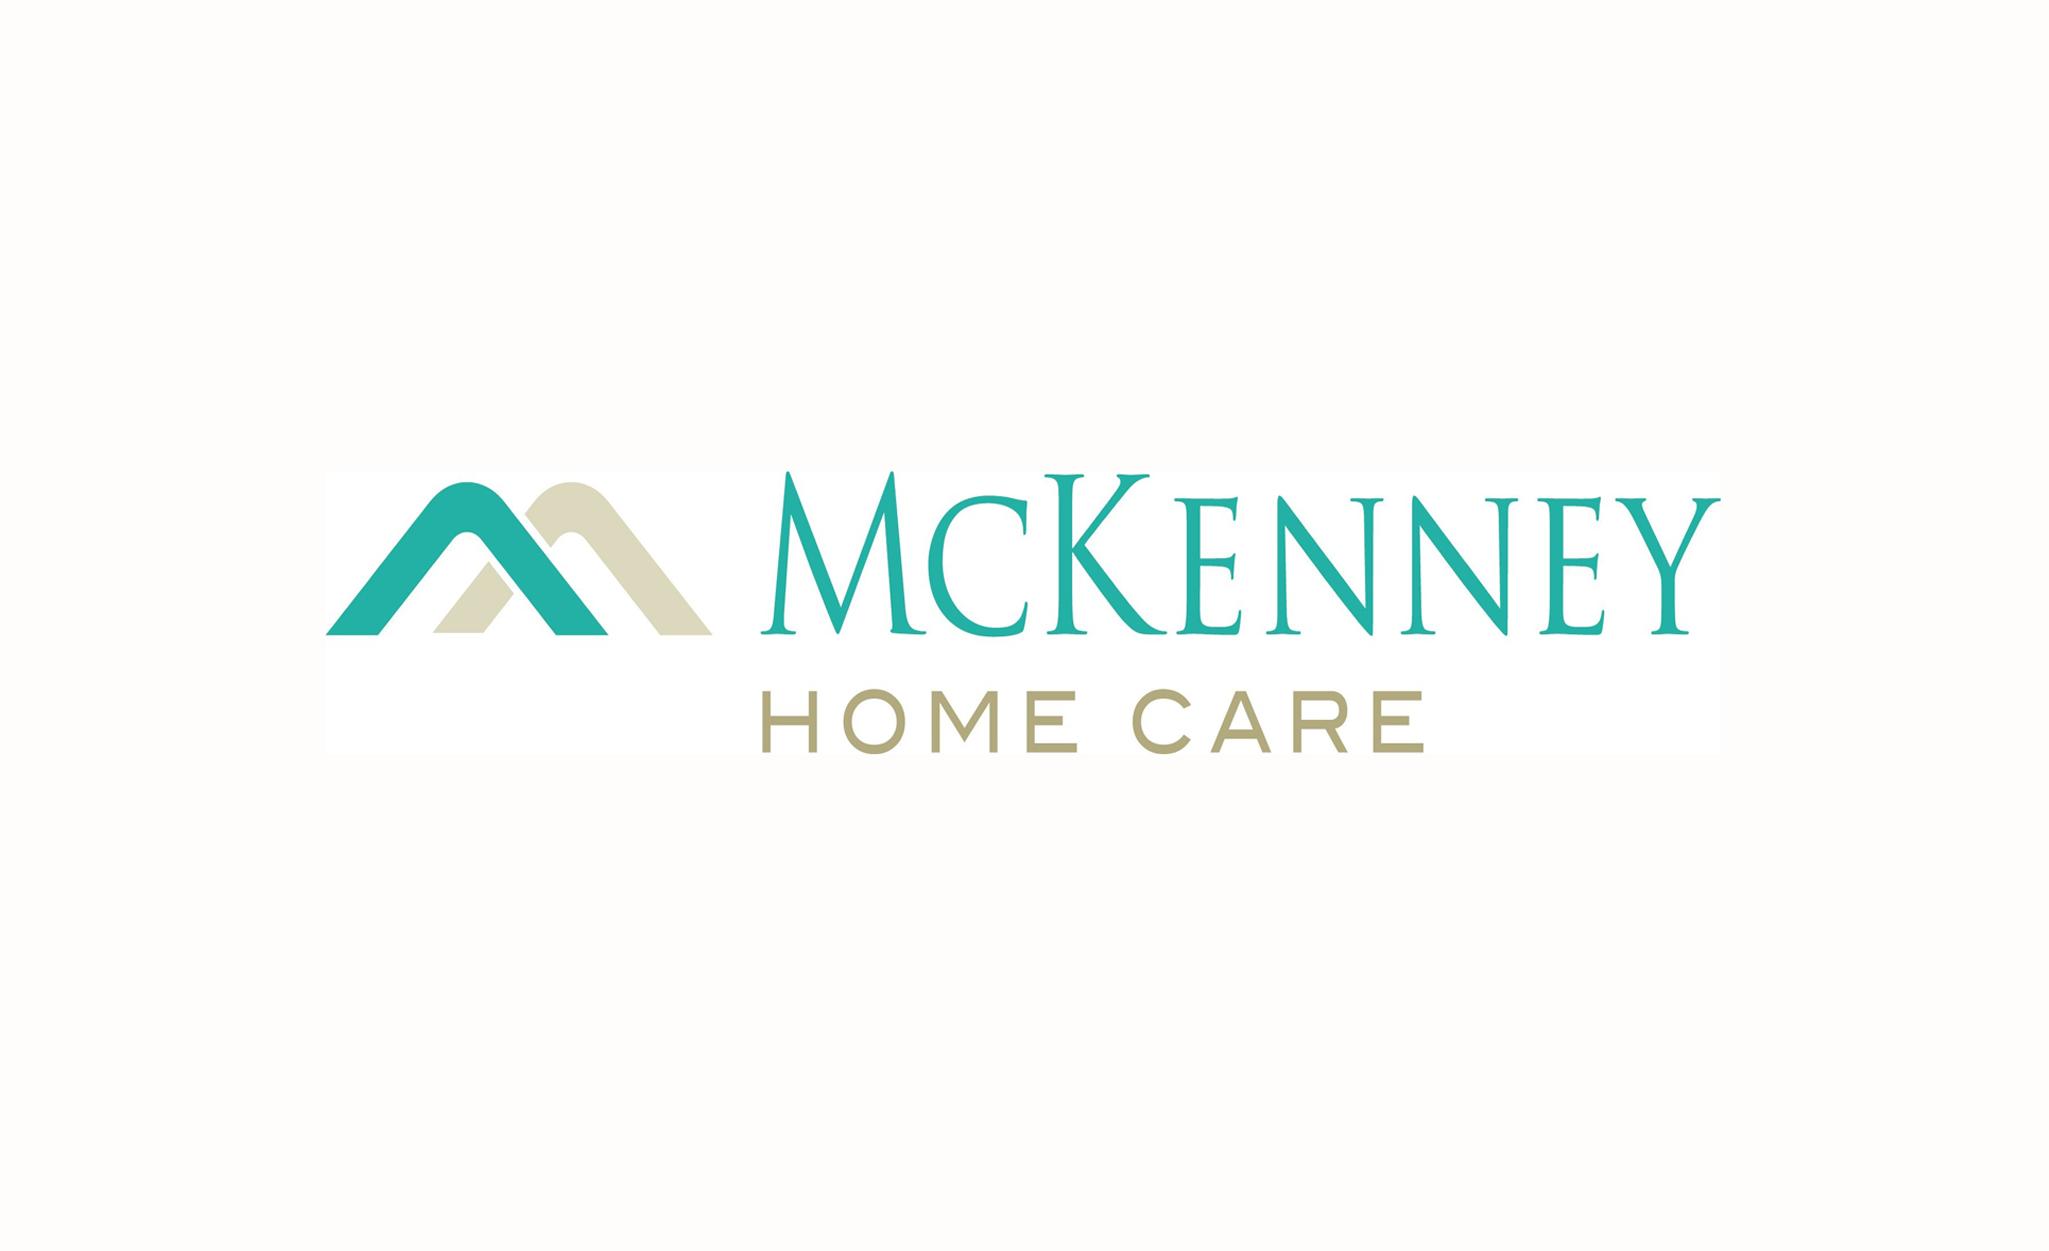 McKenney Home Care